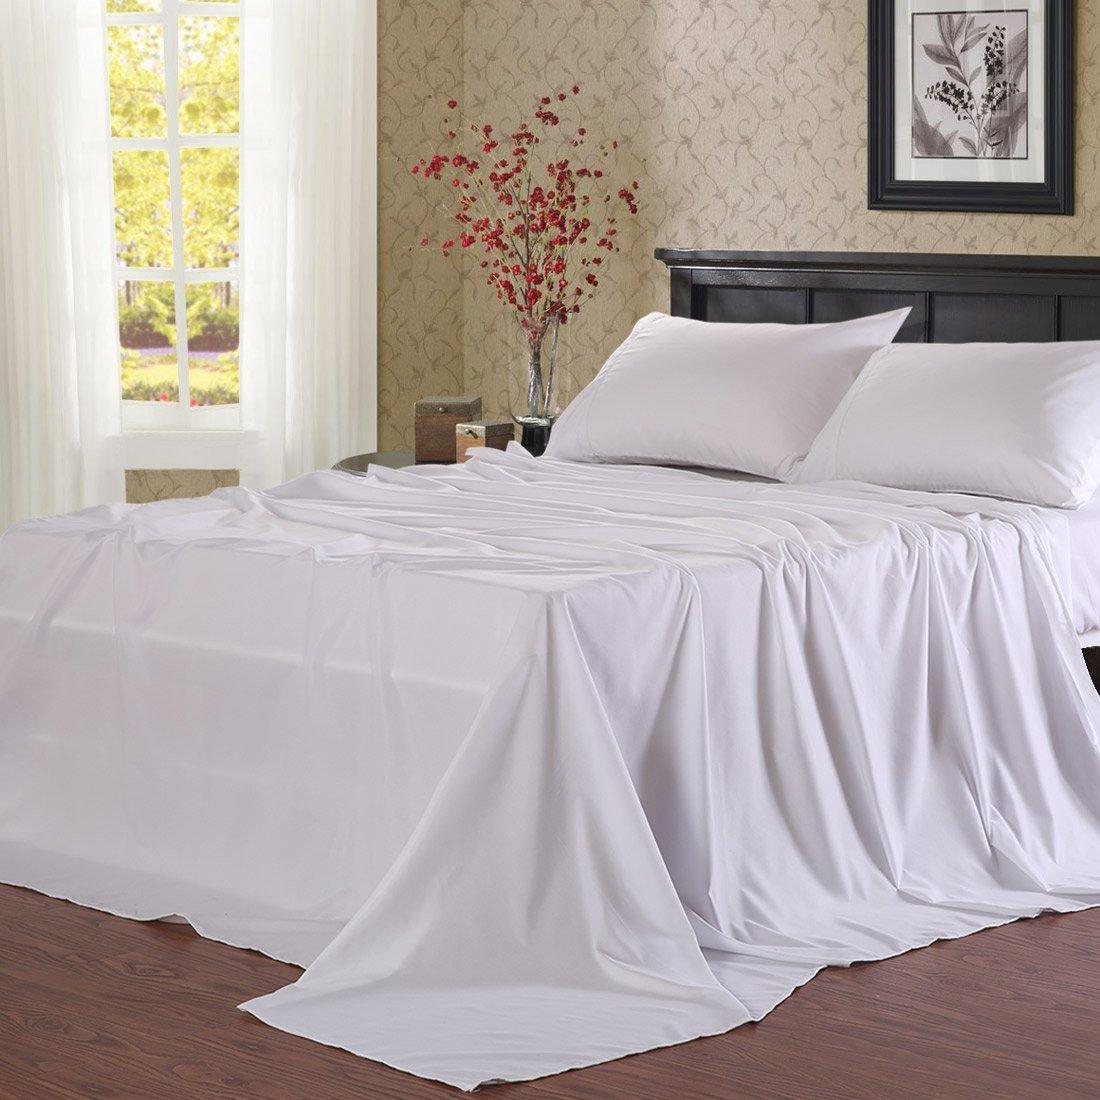 Deep Pocket Microfiber Bed Sheets $17.43 AC FS w/ Prime